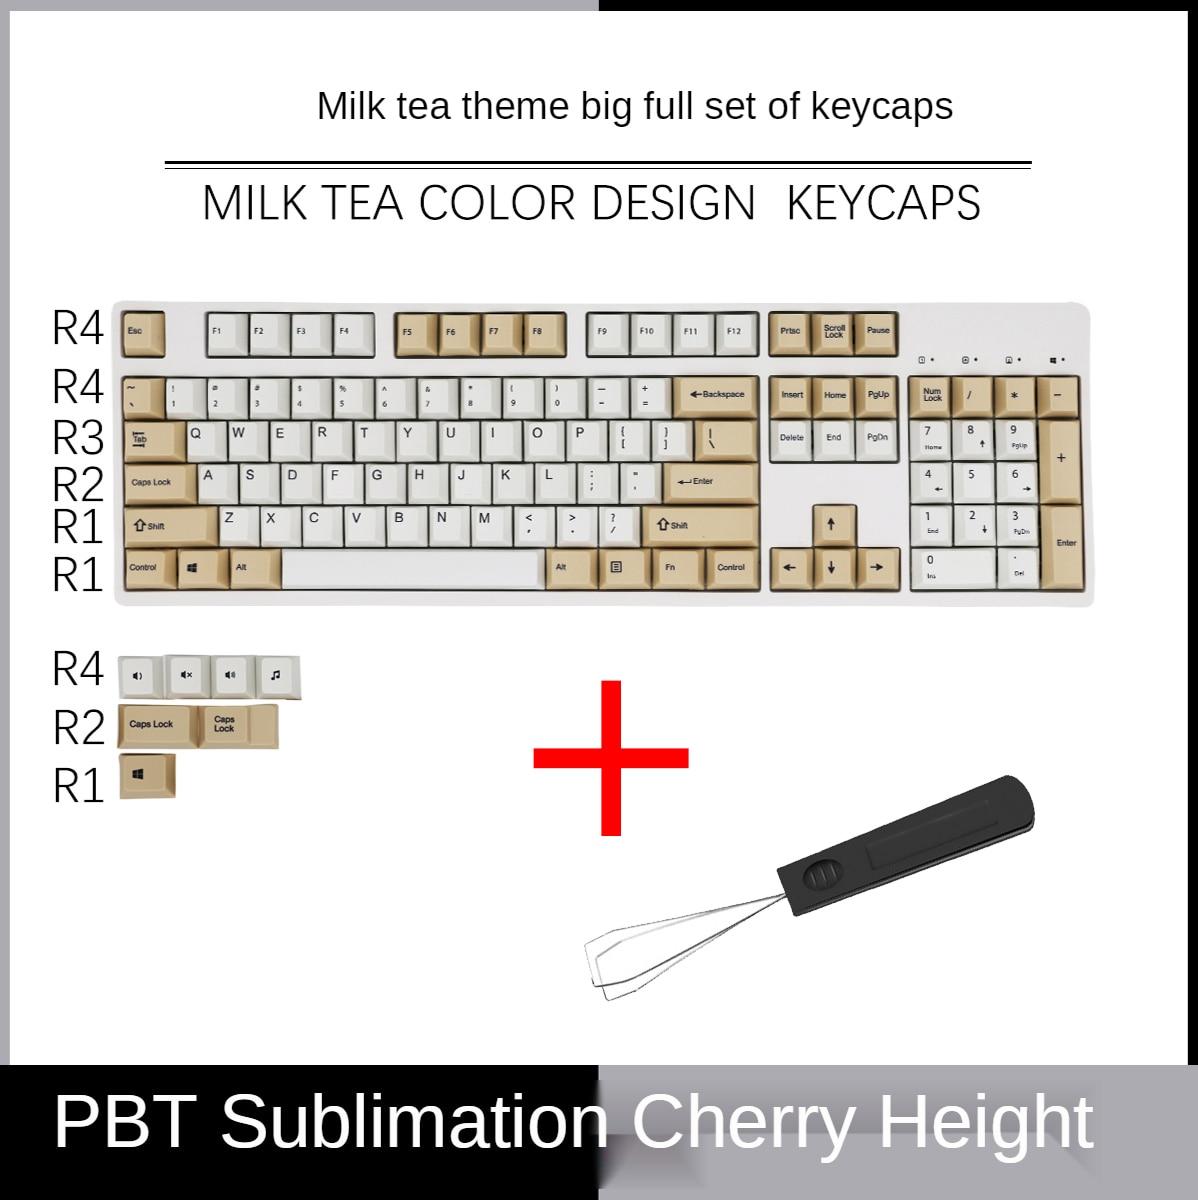 Milk tea oatmeal theme PBT sublimation original mechanical keyboard IKBC cherry height keycap keyboard caps